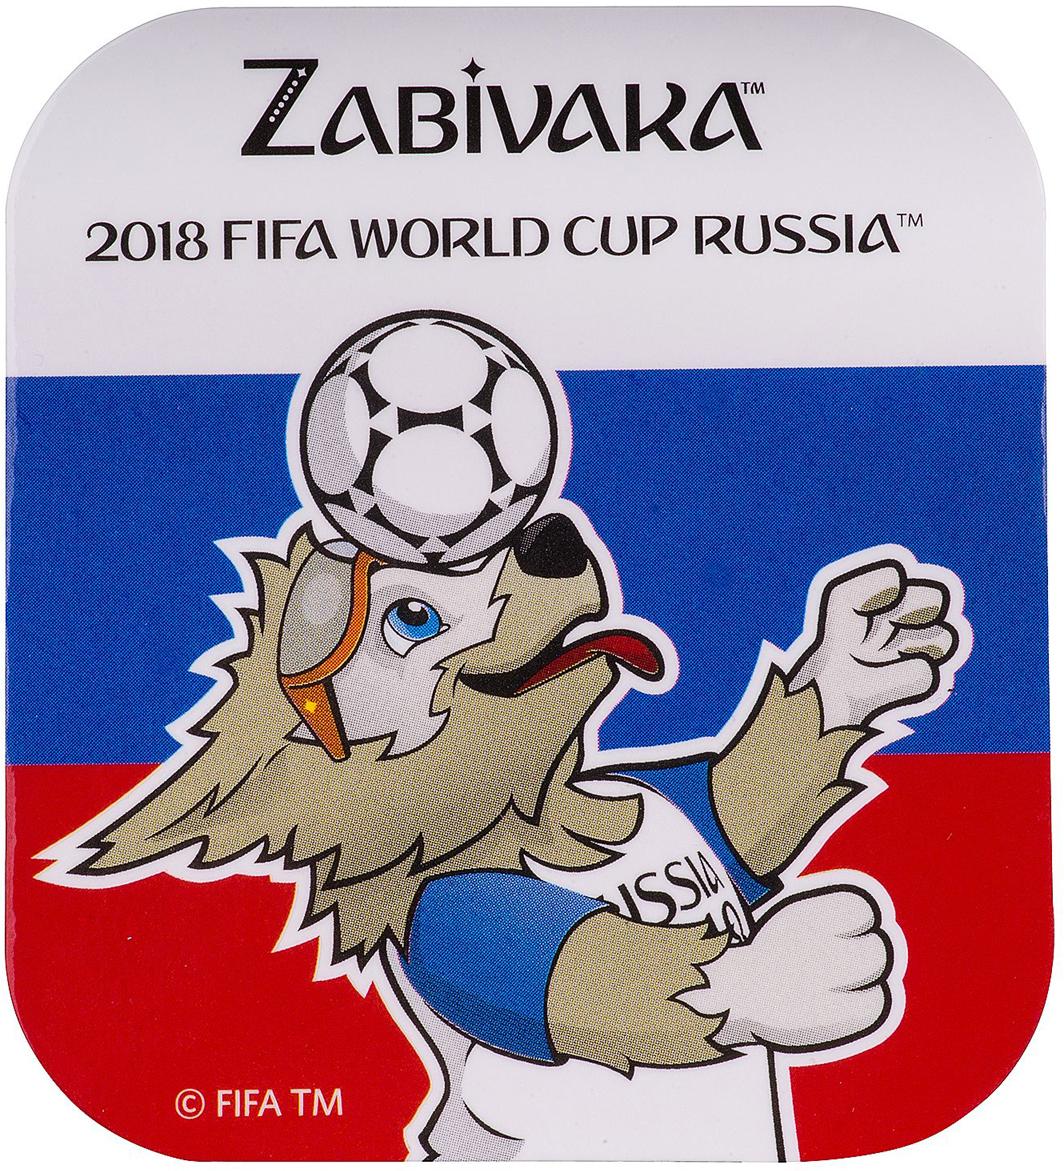 Магнит сувенирный FIFA 2018 Забивака Улыбайся!, 8 х 11 см. СН531